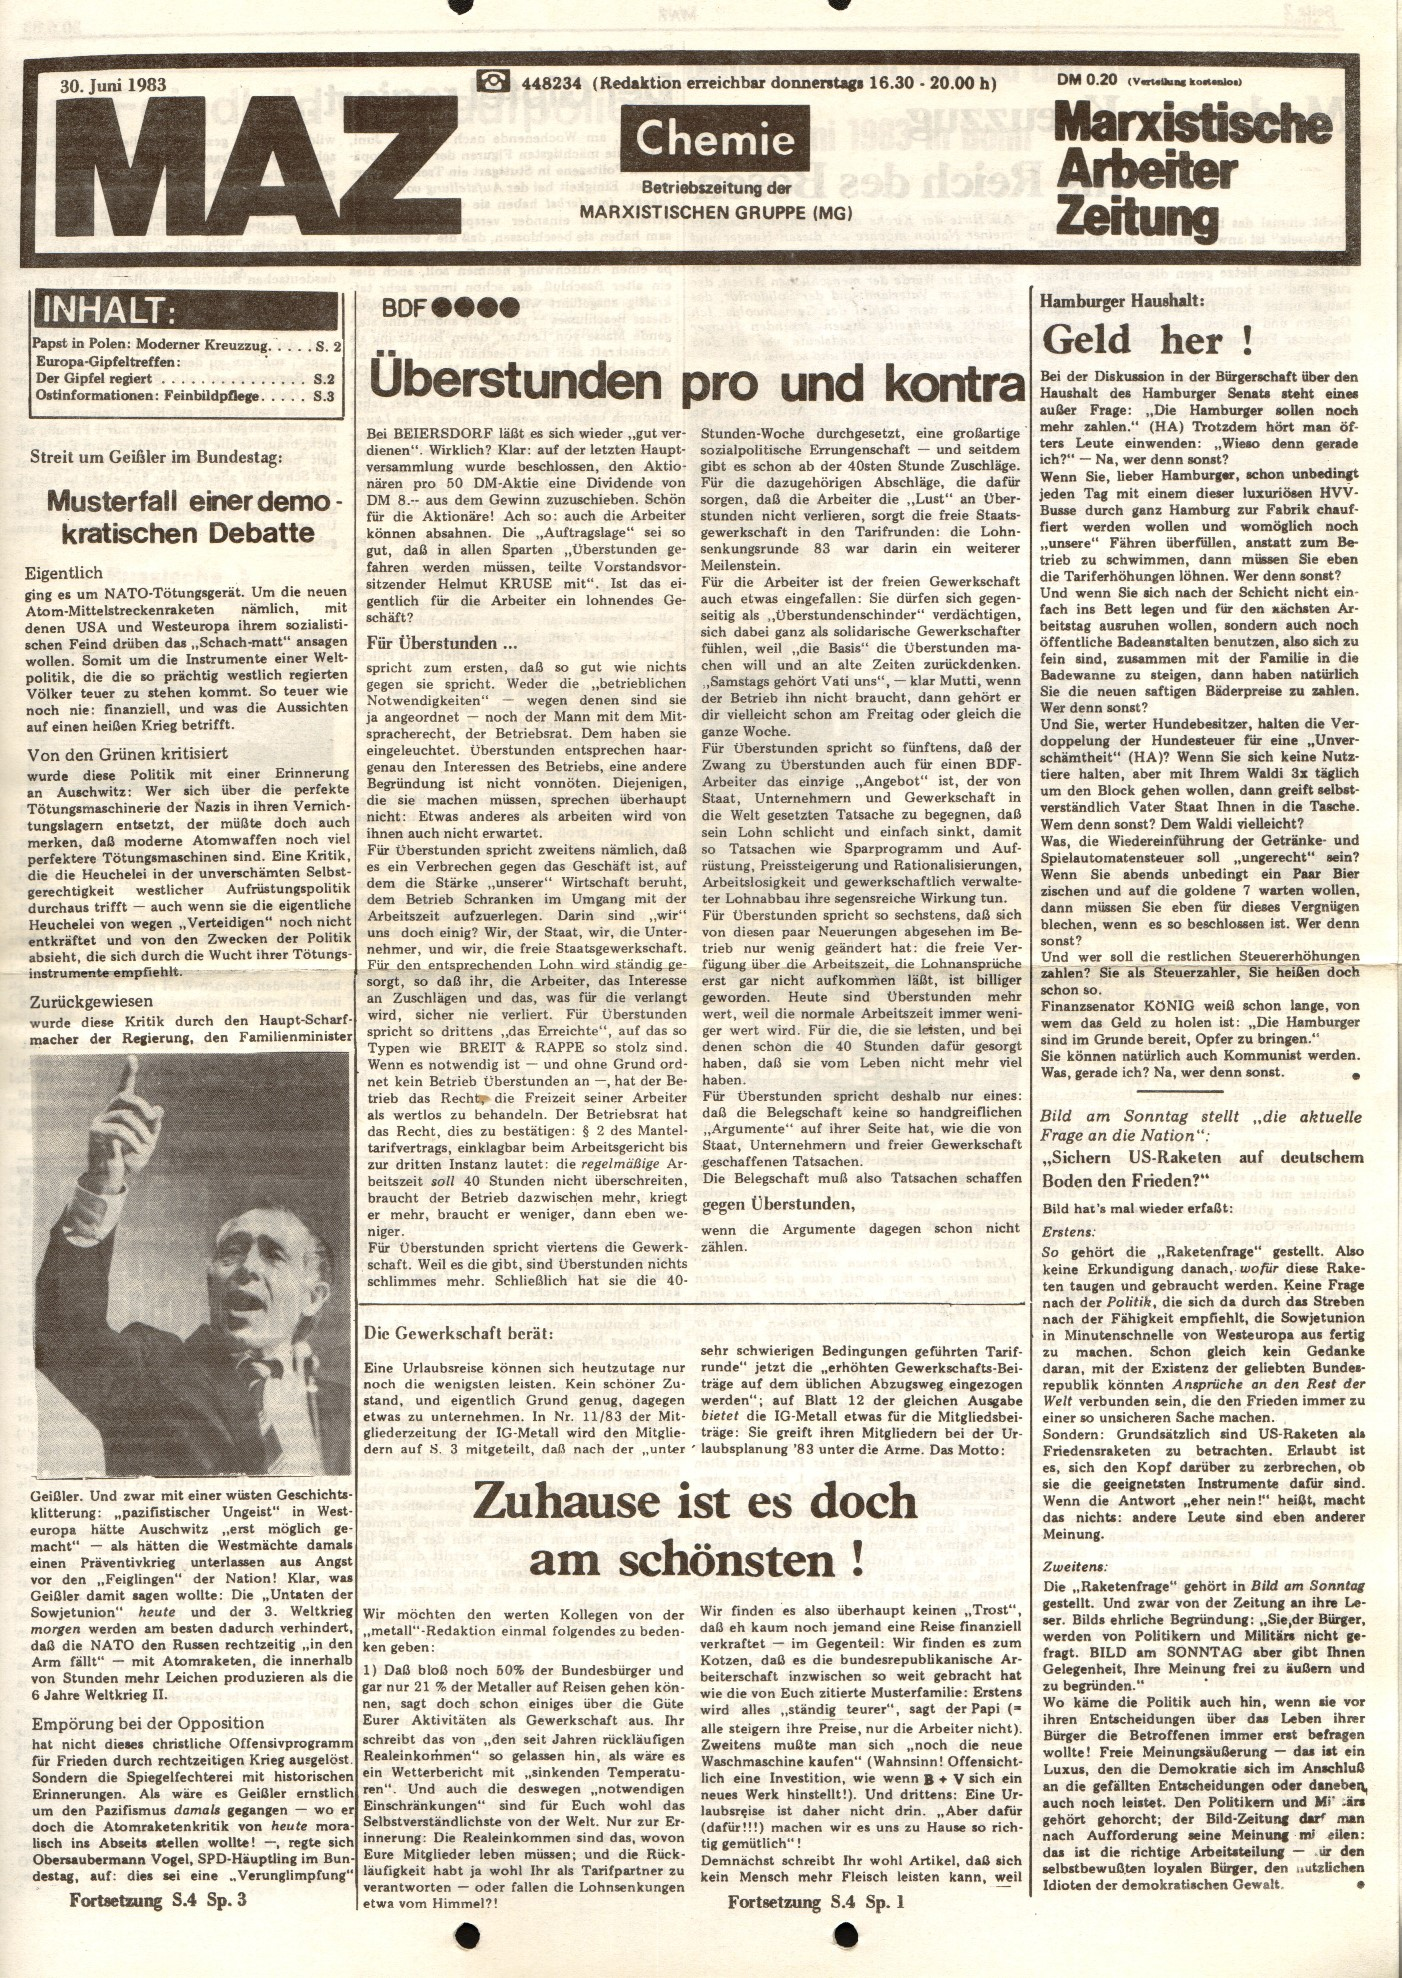 Hamburg_MG_MAZ_Chemie_19830630_01